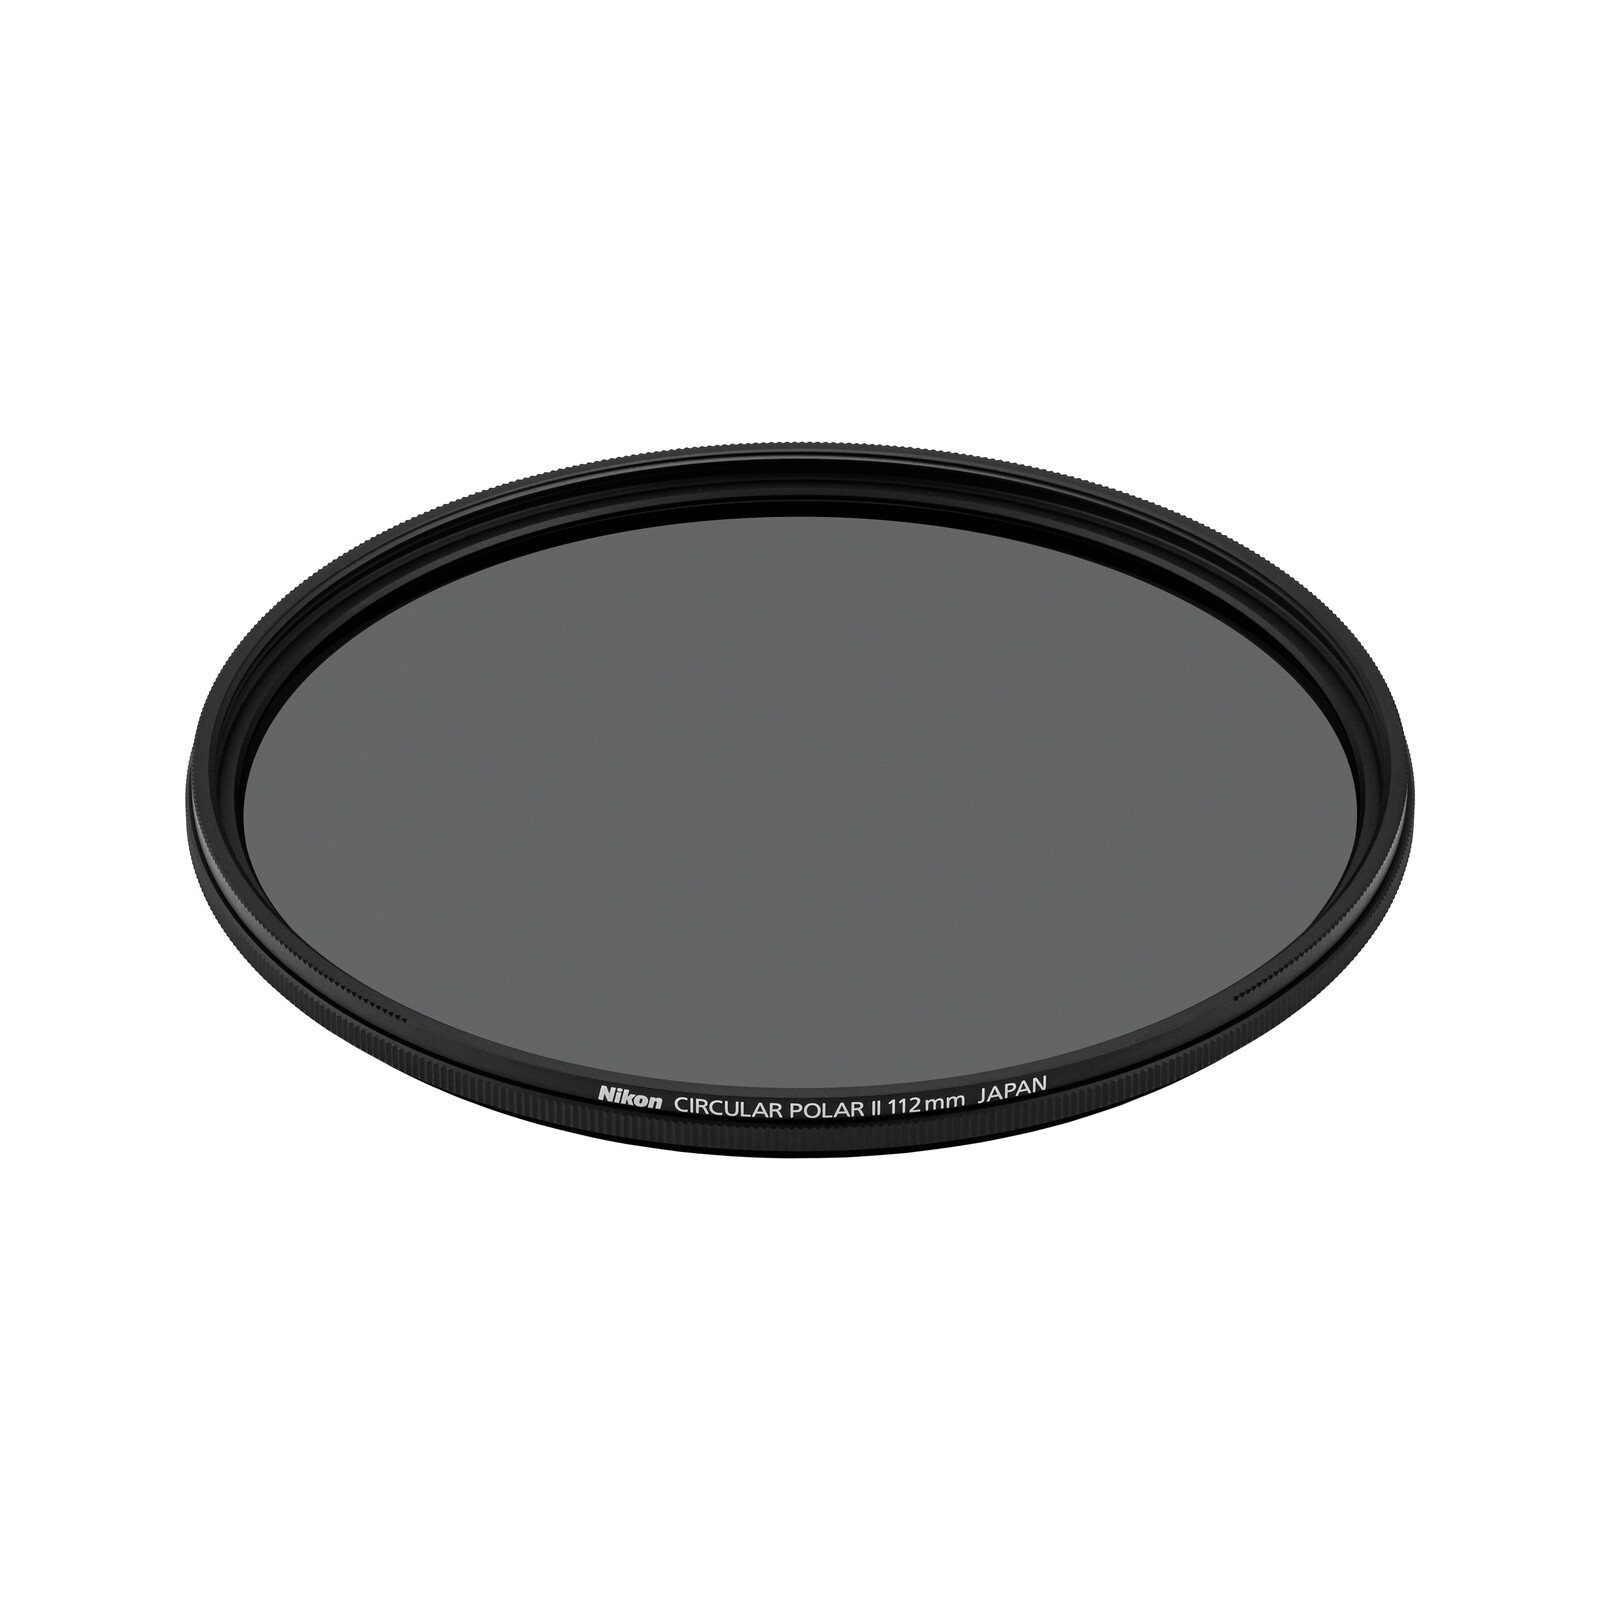 Nikon POL CIRC. II Filter 112mm